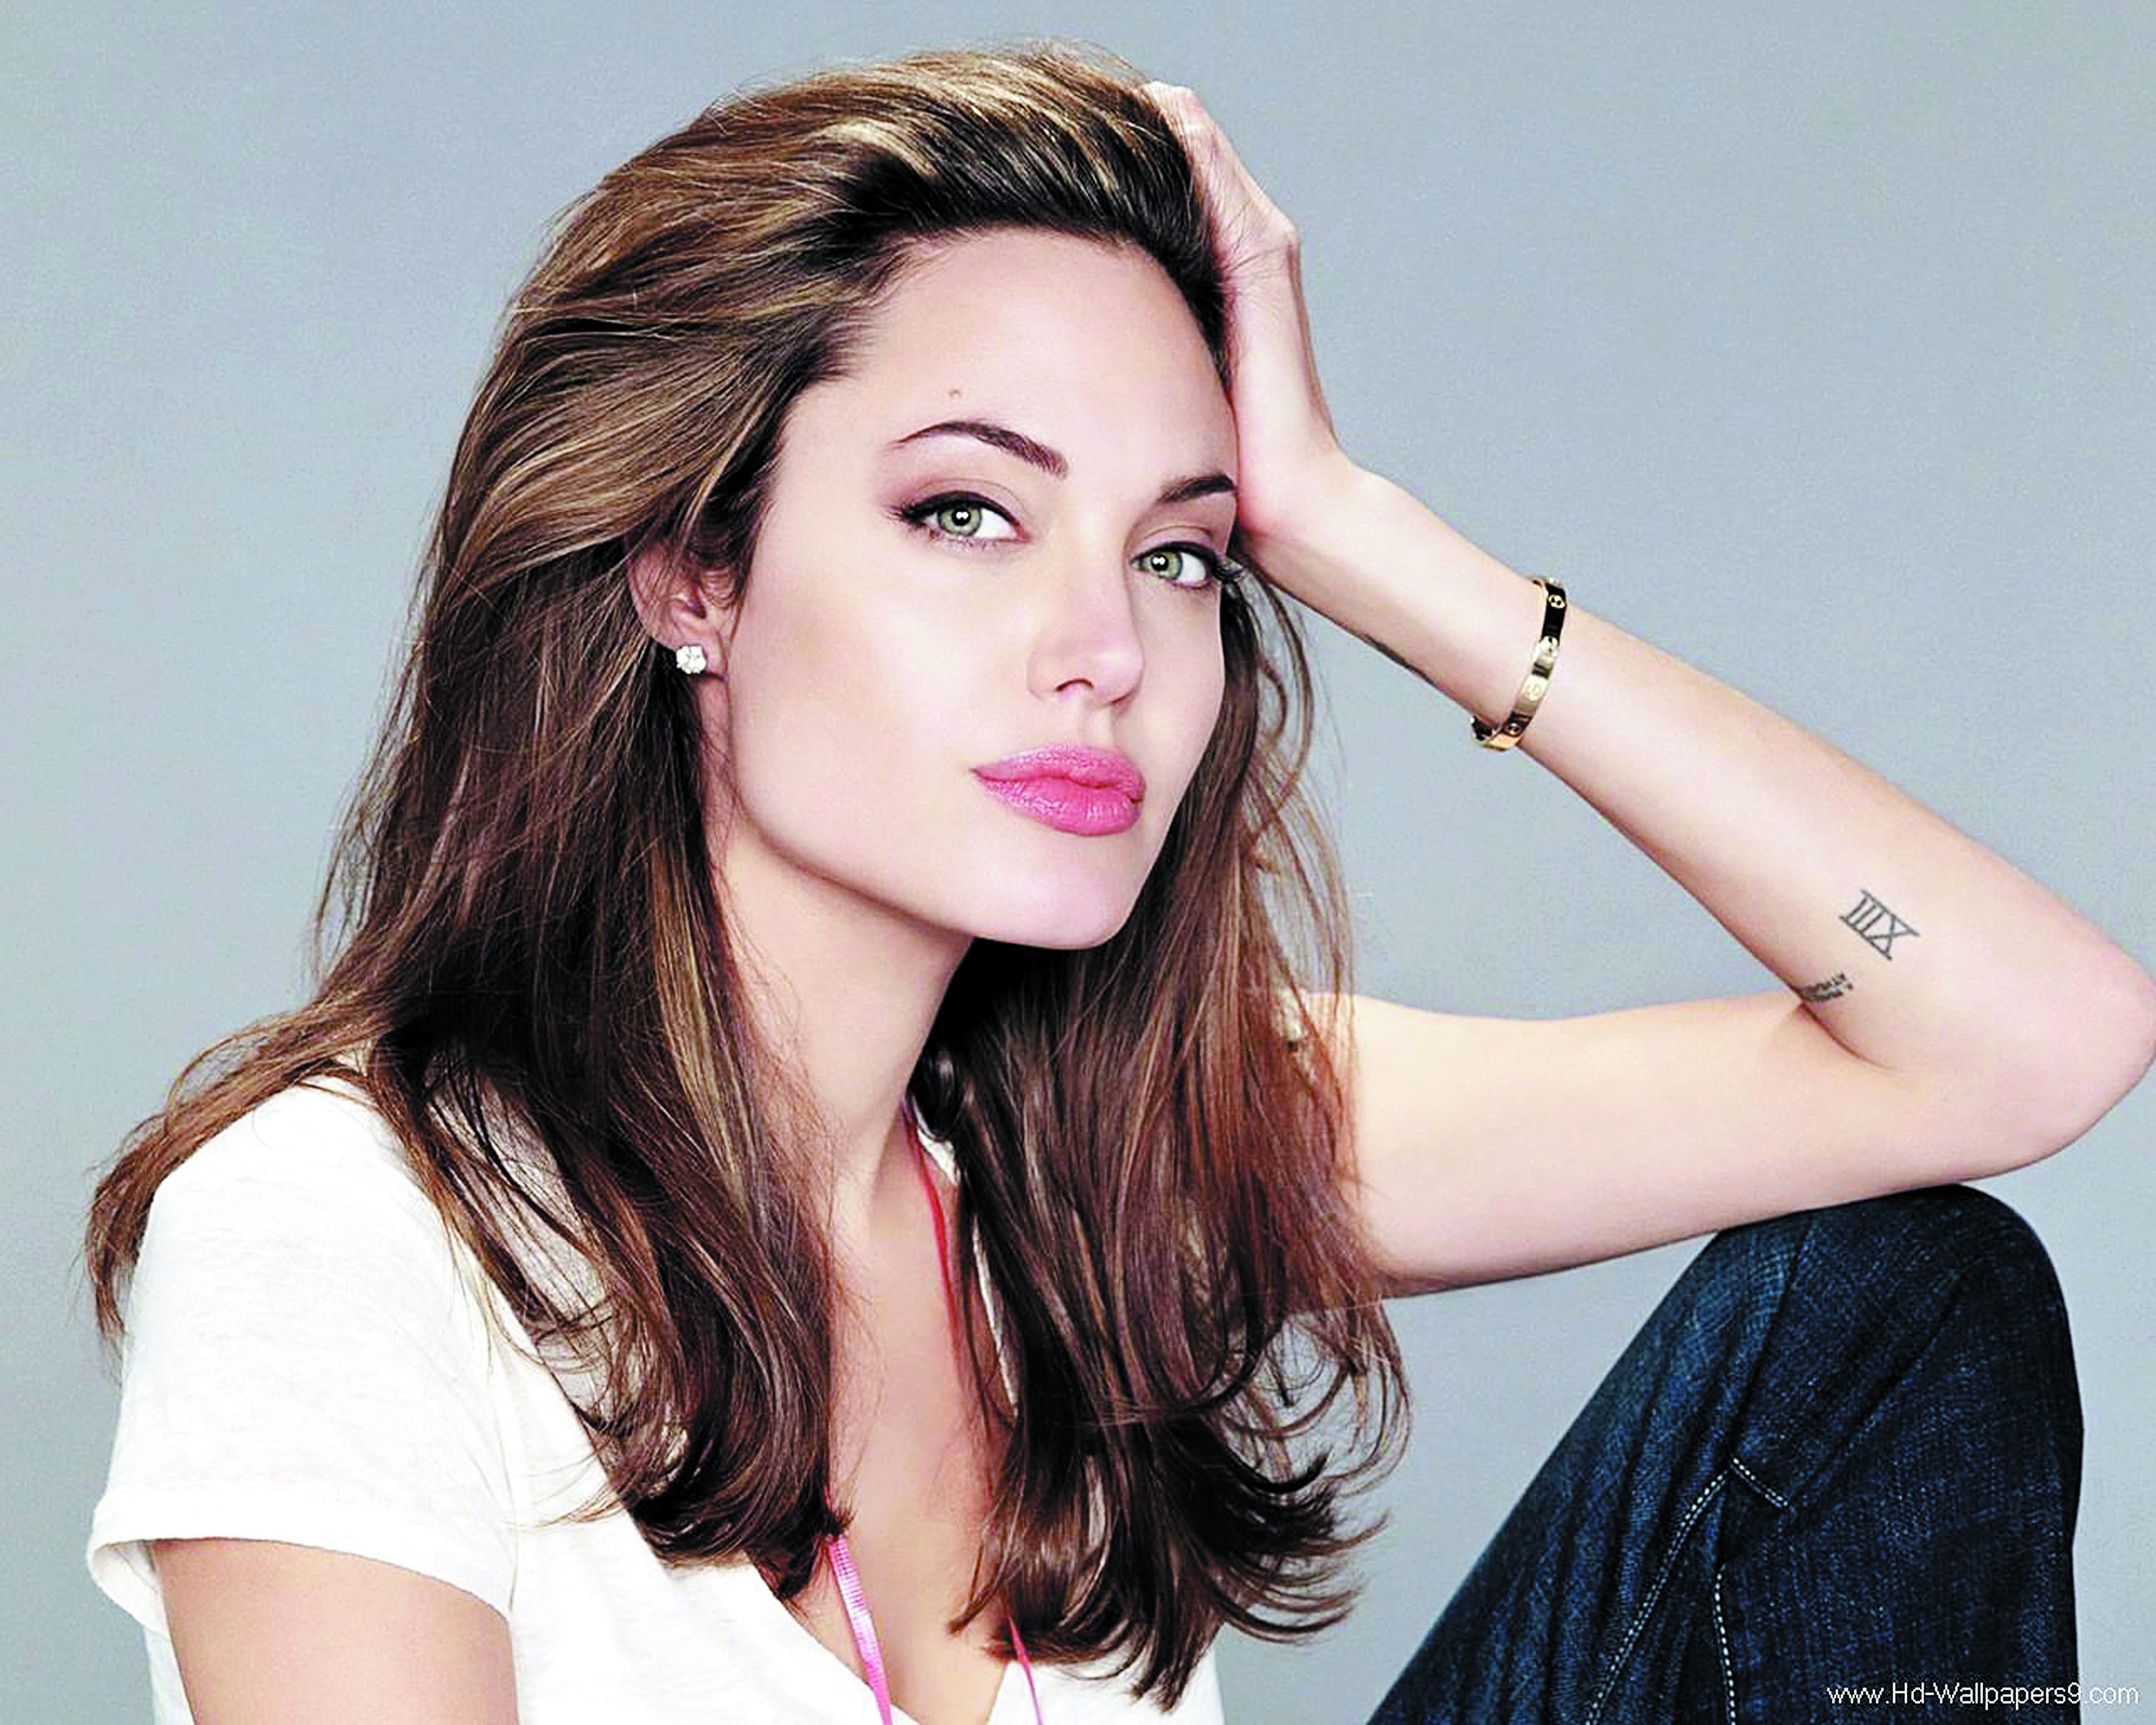 Angelina Jolie : Je n'ai jamais aimé être actrice